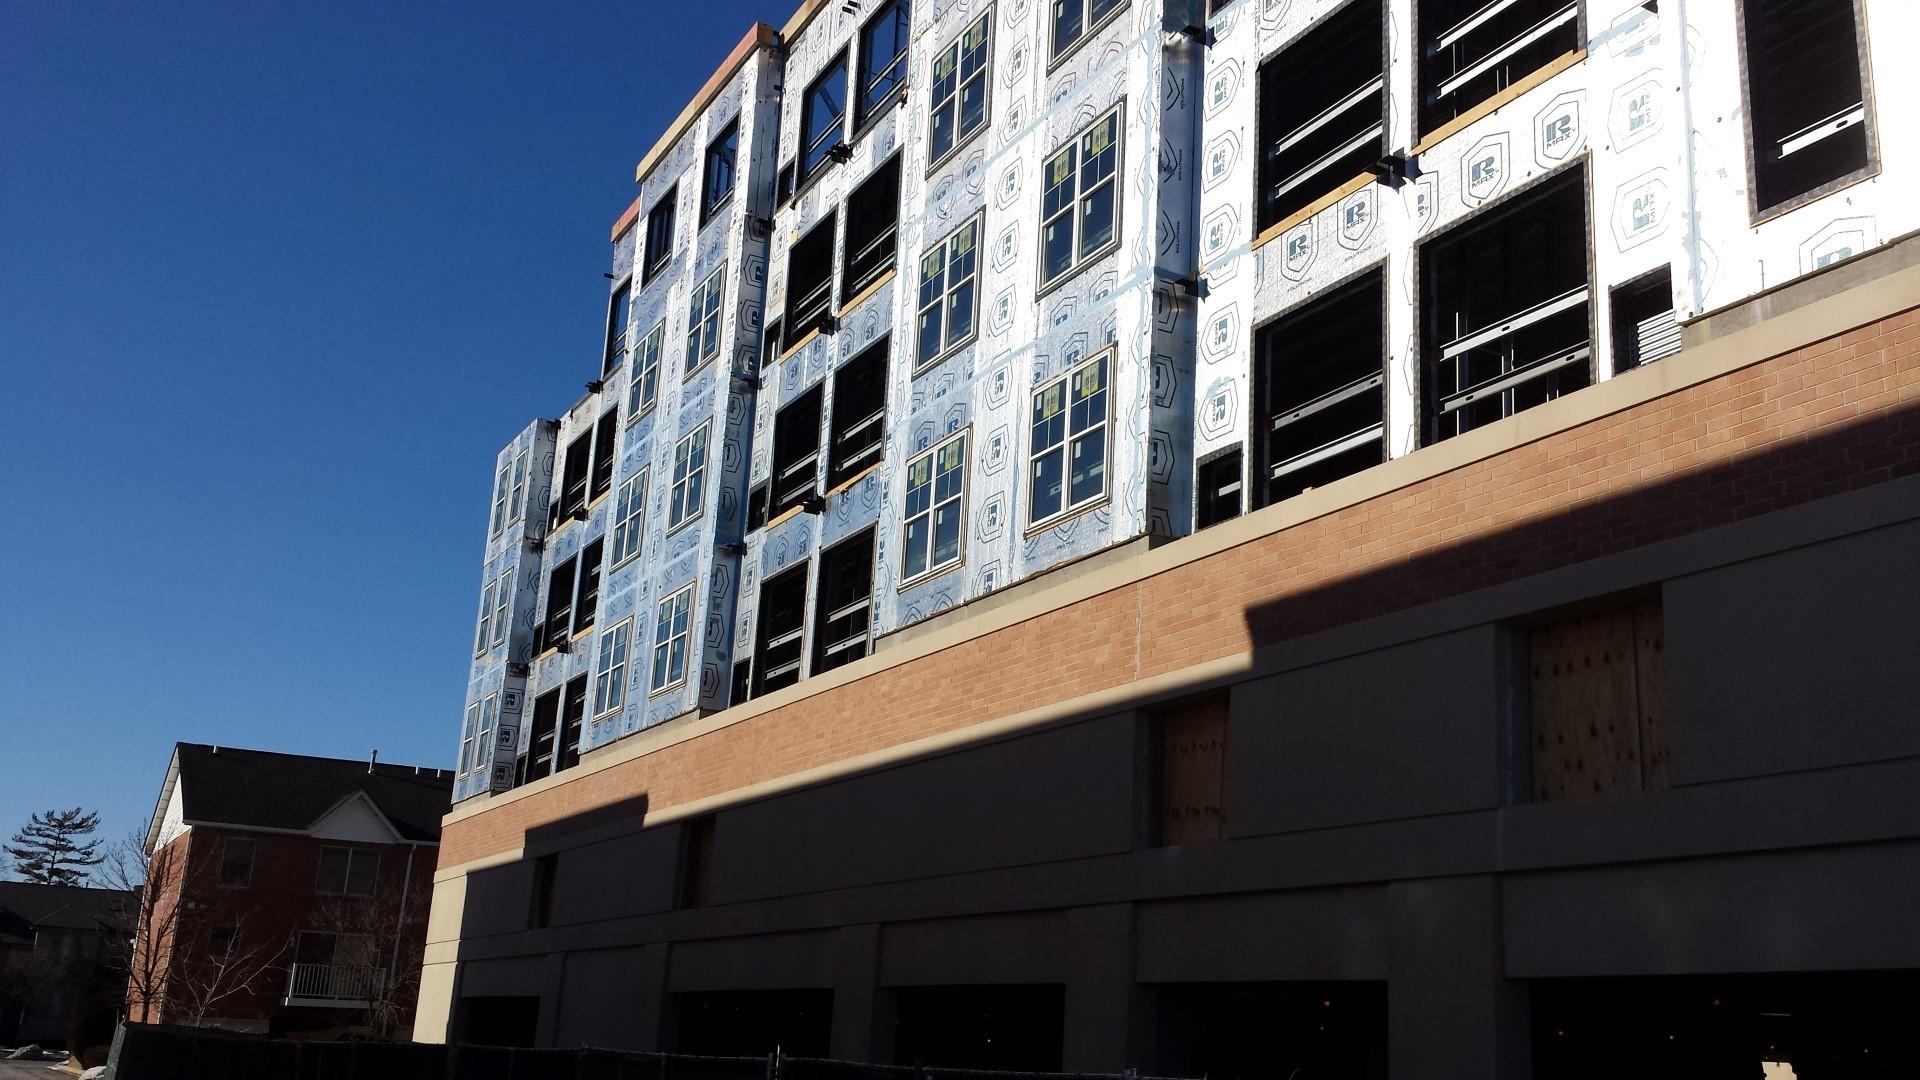 Elmhurst 255 - Elmhurst, Illinois: ECOMAXci™ Wall Solution